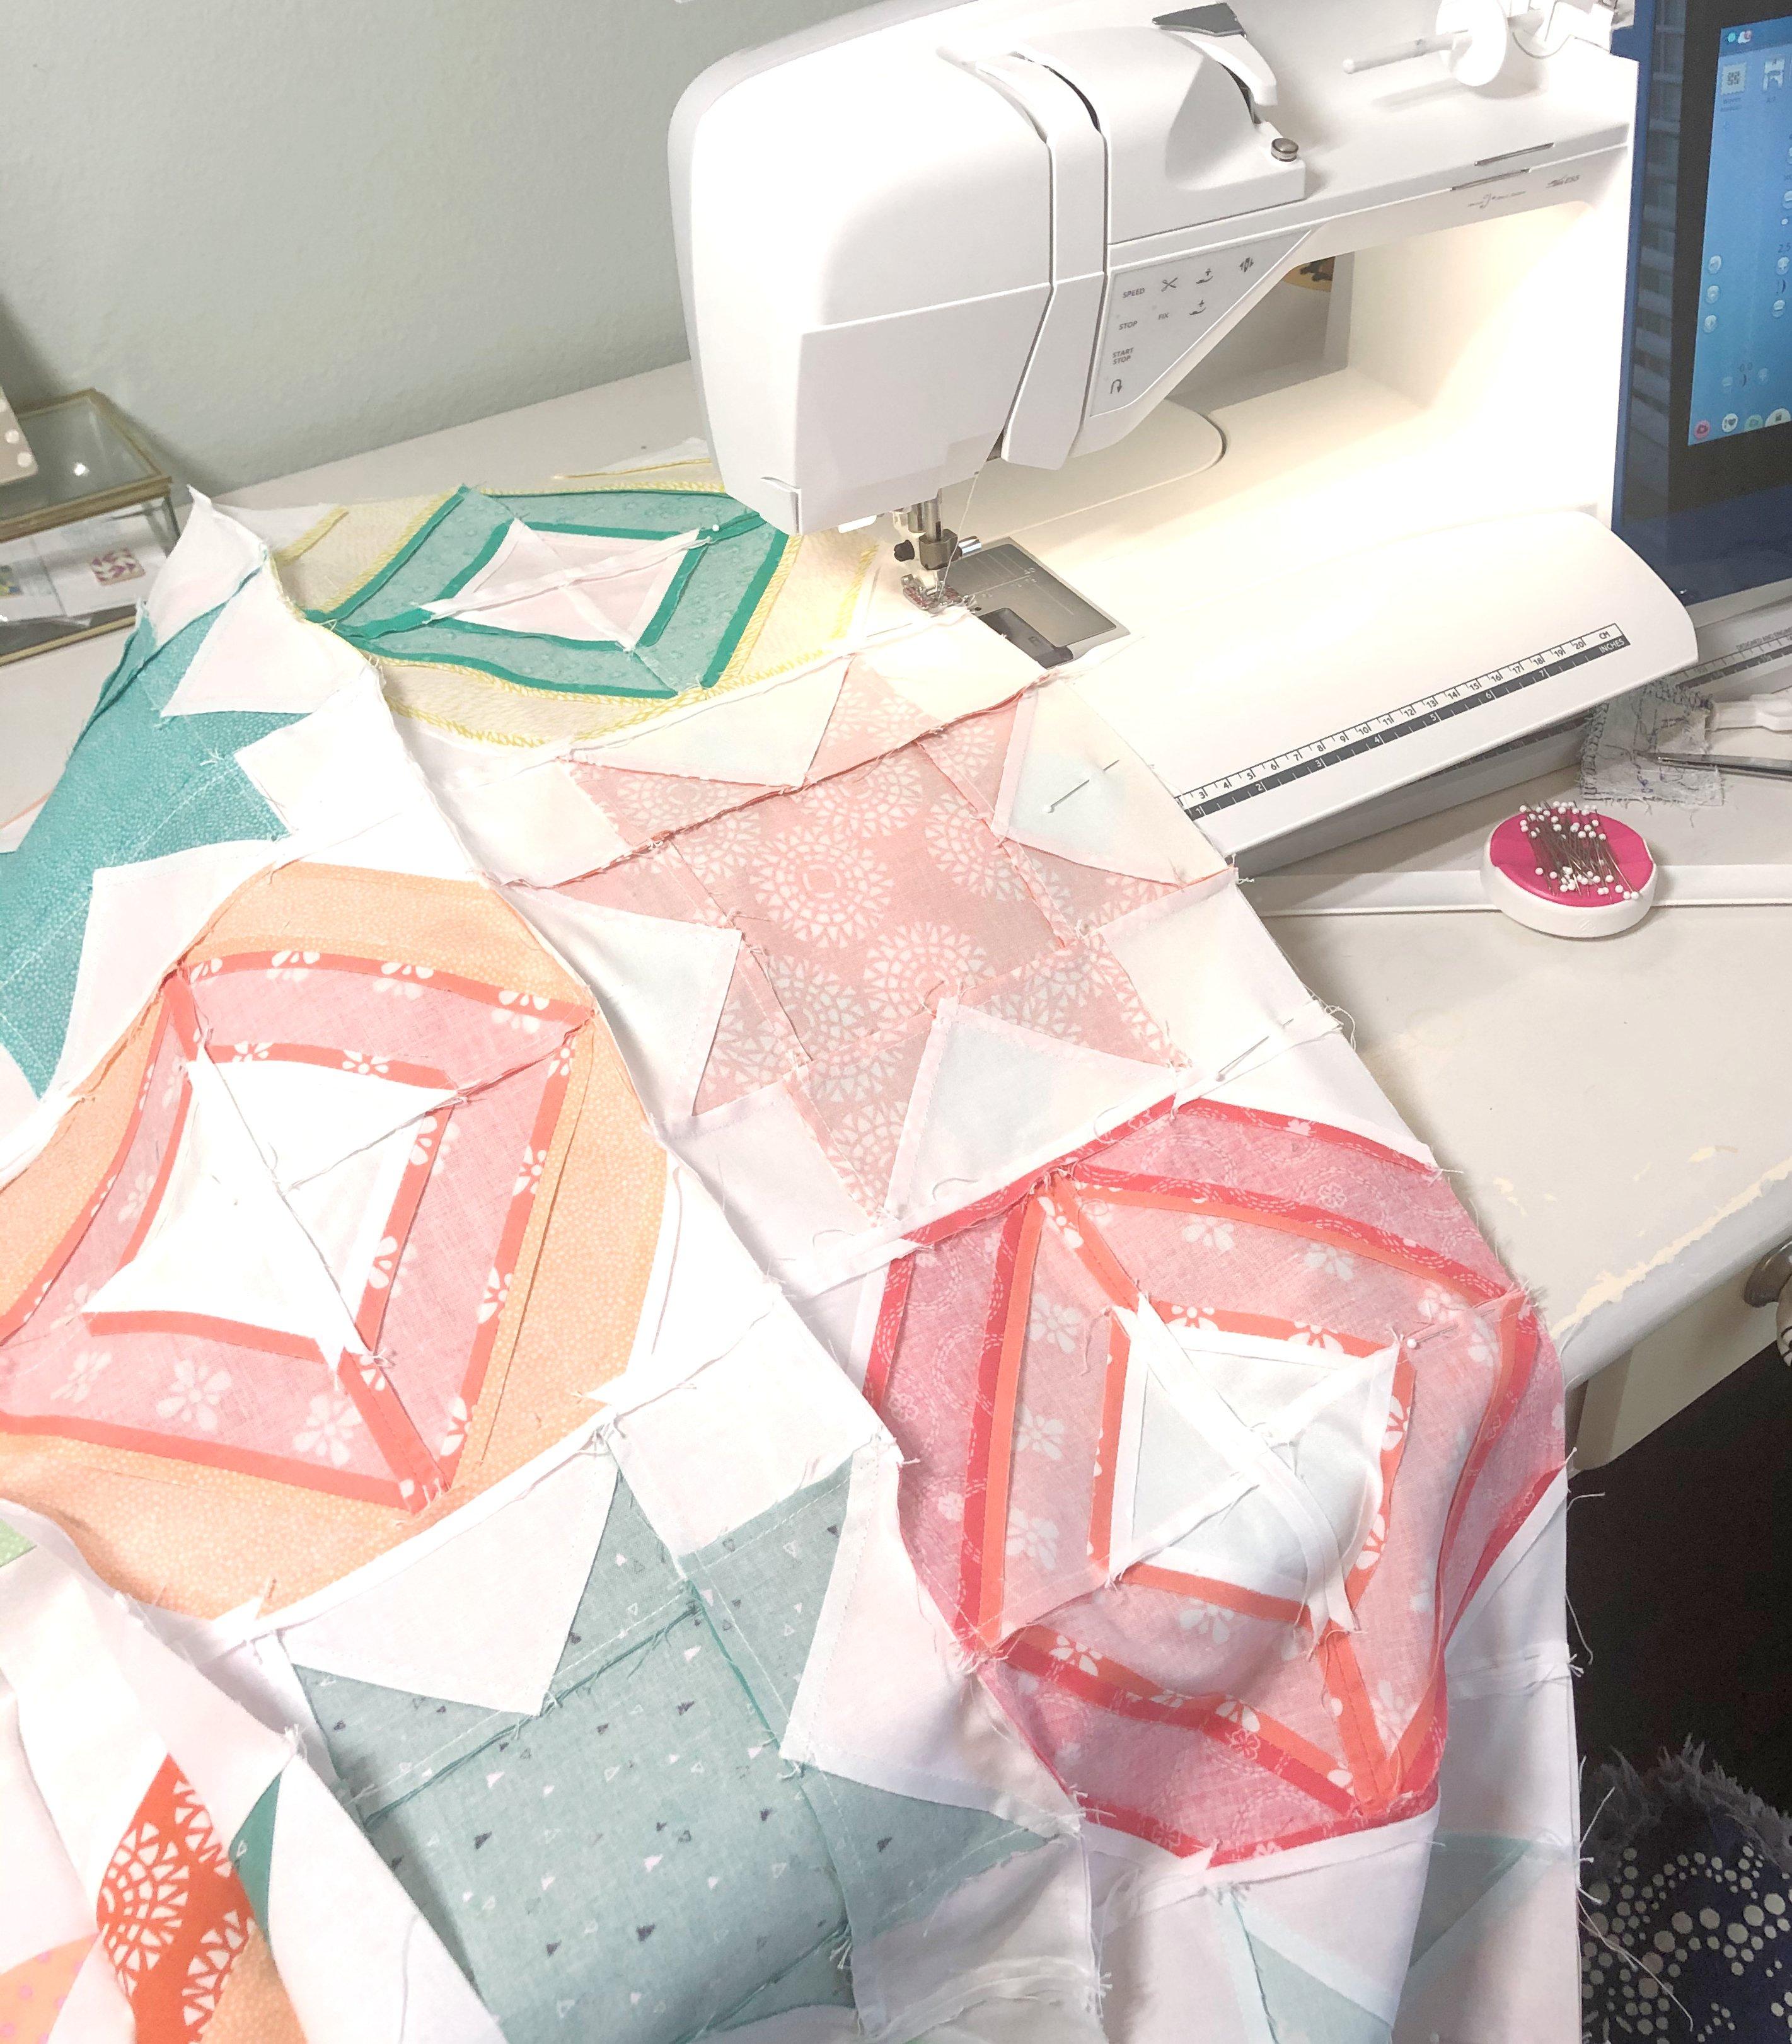 2 block quilt sewing seams